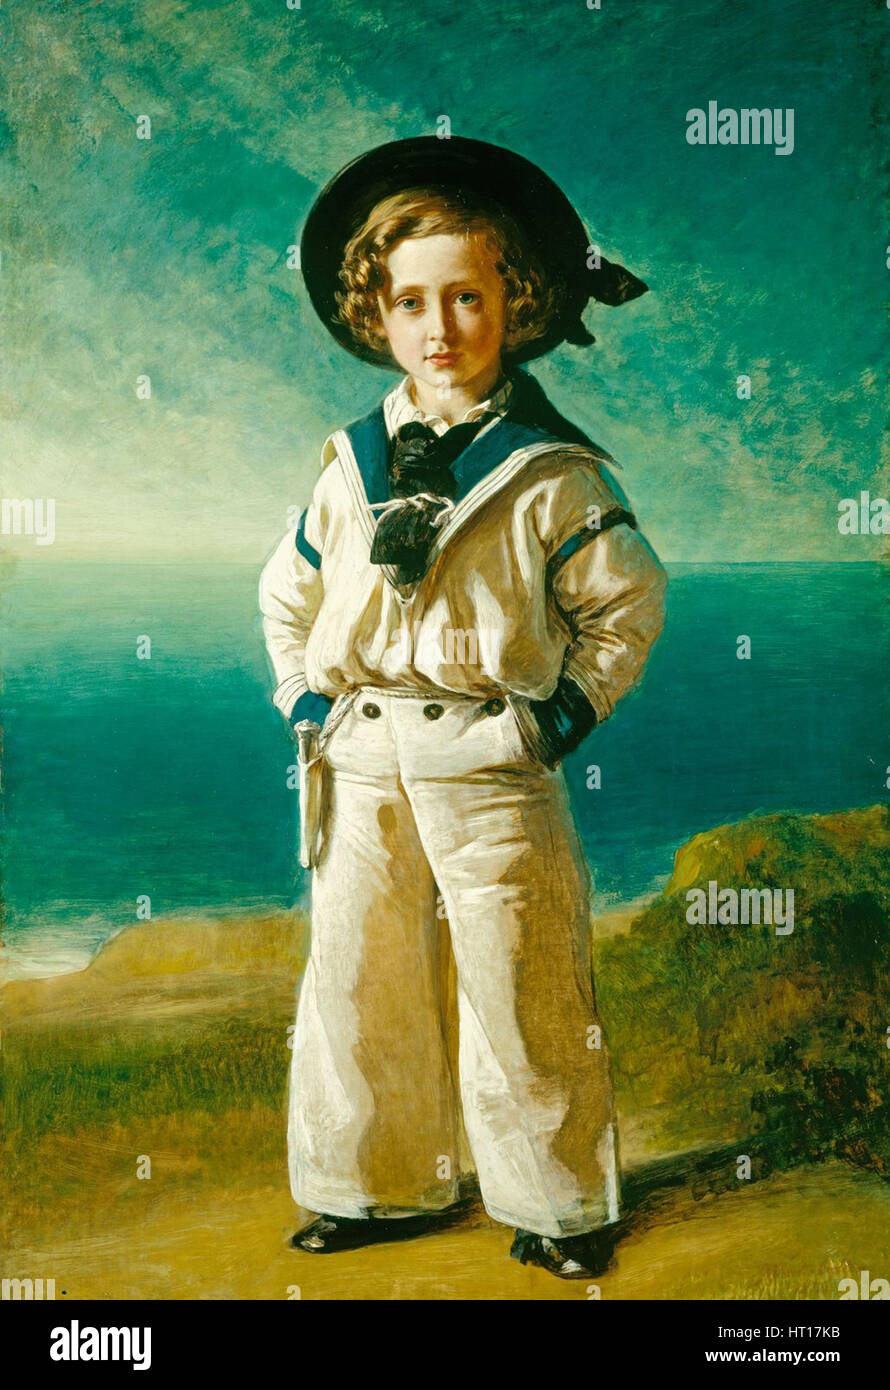 King Edward VII (1841-1910), when Albert Edward, Prince of Wales, 1846. Artist: Winterhalter, Franz Xavier (1805 - Stock Image